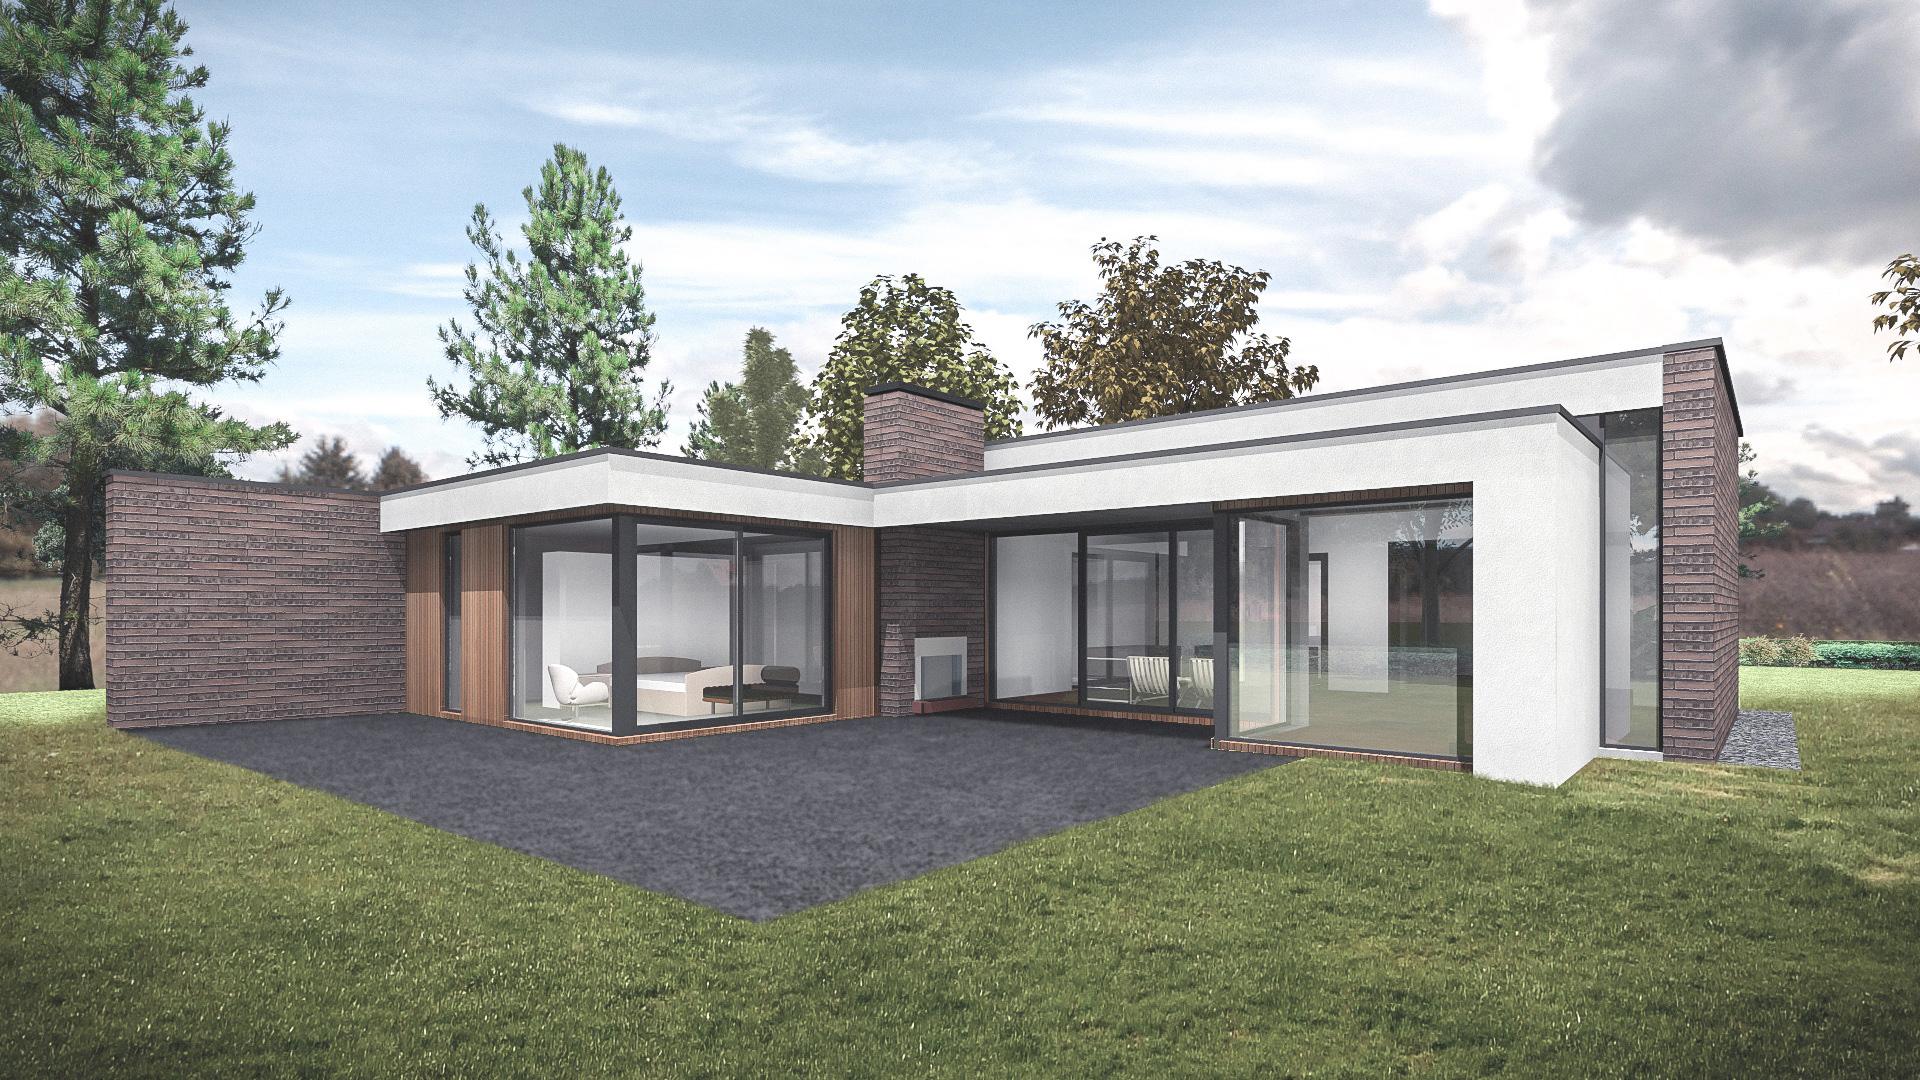 nieuwbouw-villa-utrechtse-heuvelrug-modern-maarn-overdekt-terras